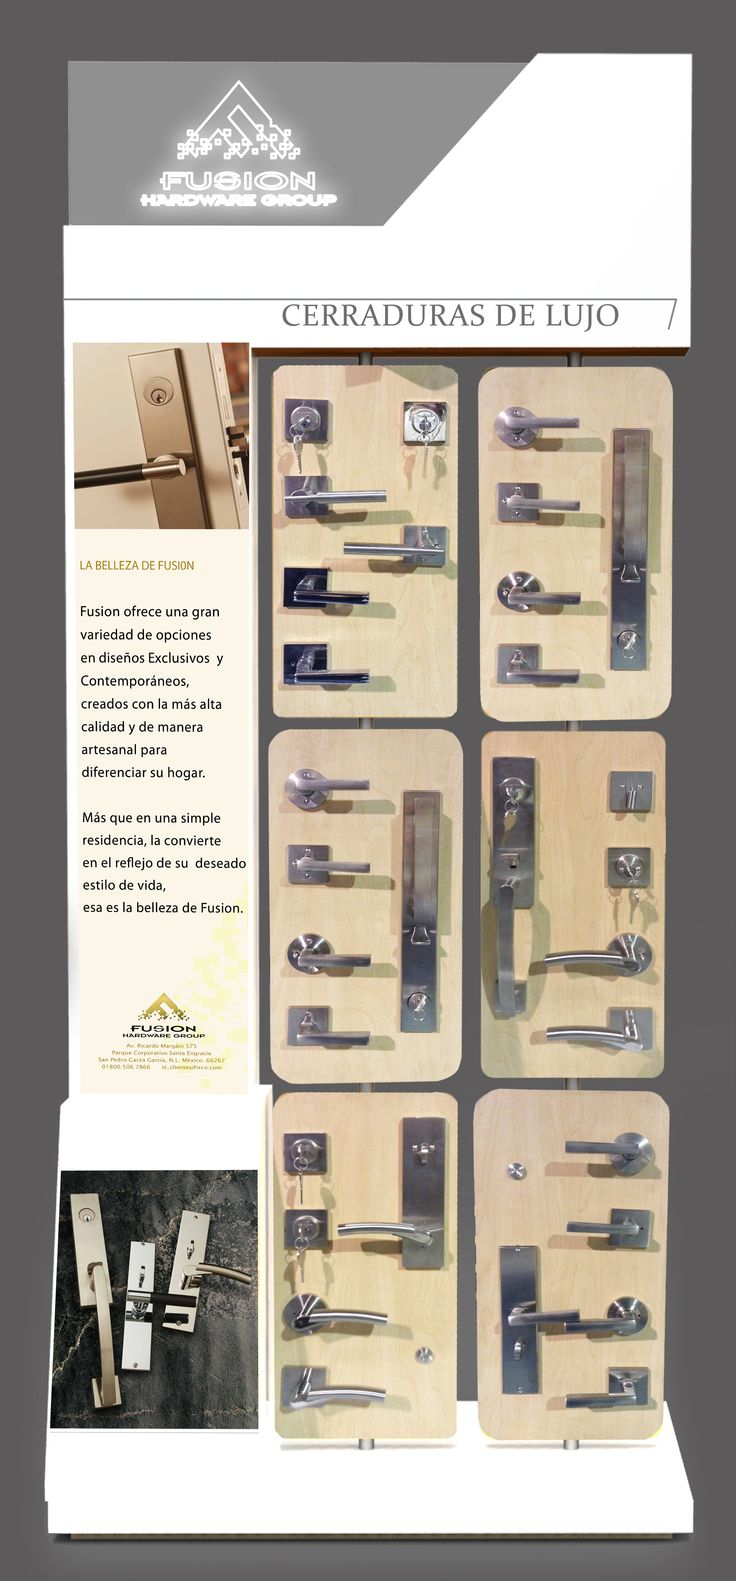 FUSION HARDWARE DISPLAY 2014 www.lumnivision.com #DISPLAY #POP #SONY #NACHO_CASTILLO #fusion #MONTERREY #DESIGN #electrical #retail_design #industrial_design #MX #CocaCola #Display #P.O.P. #pointofpurchase #POPDisplay #Mexico #MXdesign #RodrigoOlvera #RO_OLVERA #hielera #hieleras glorificador #exhibidores #cajas de luz #puntodeventa #lumnivision #fusionhardware #fusionlocks #allegion #allegiondisplay #ingersollrand #ingersoll_rand